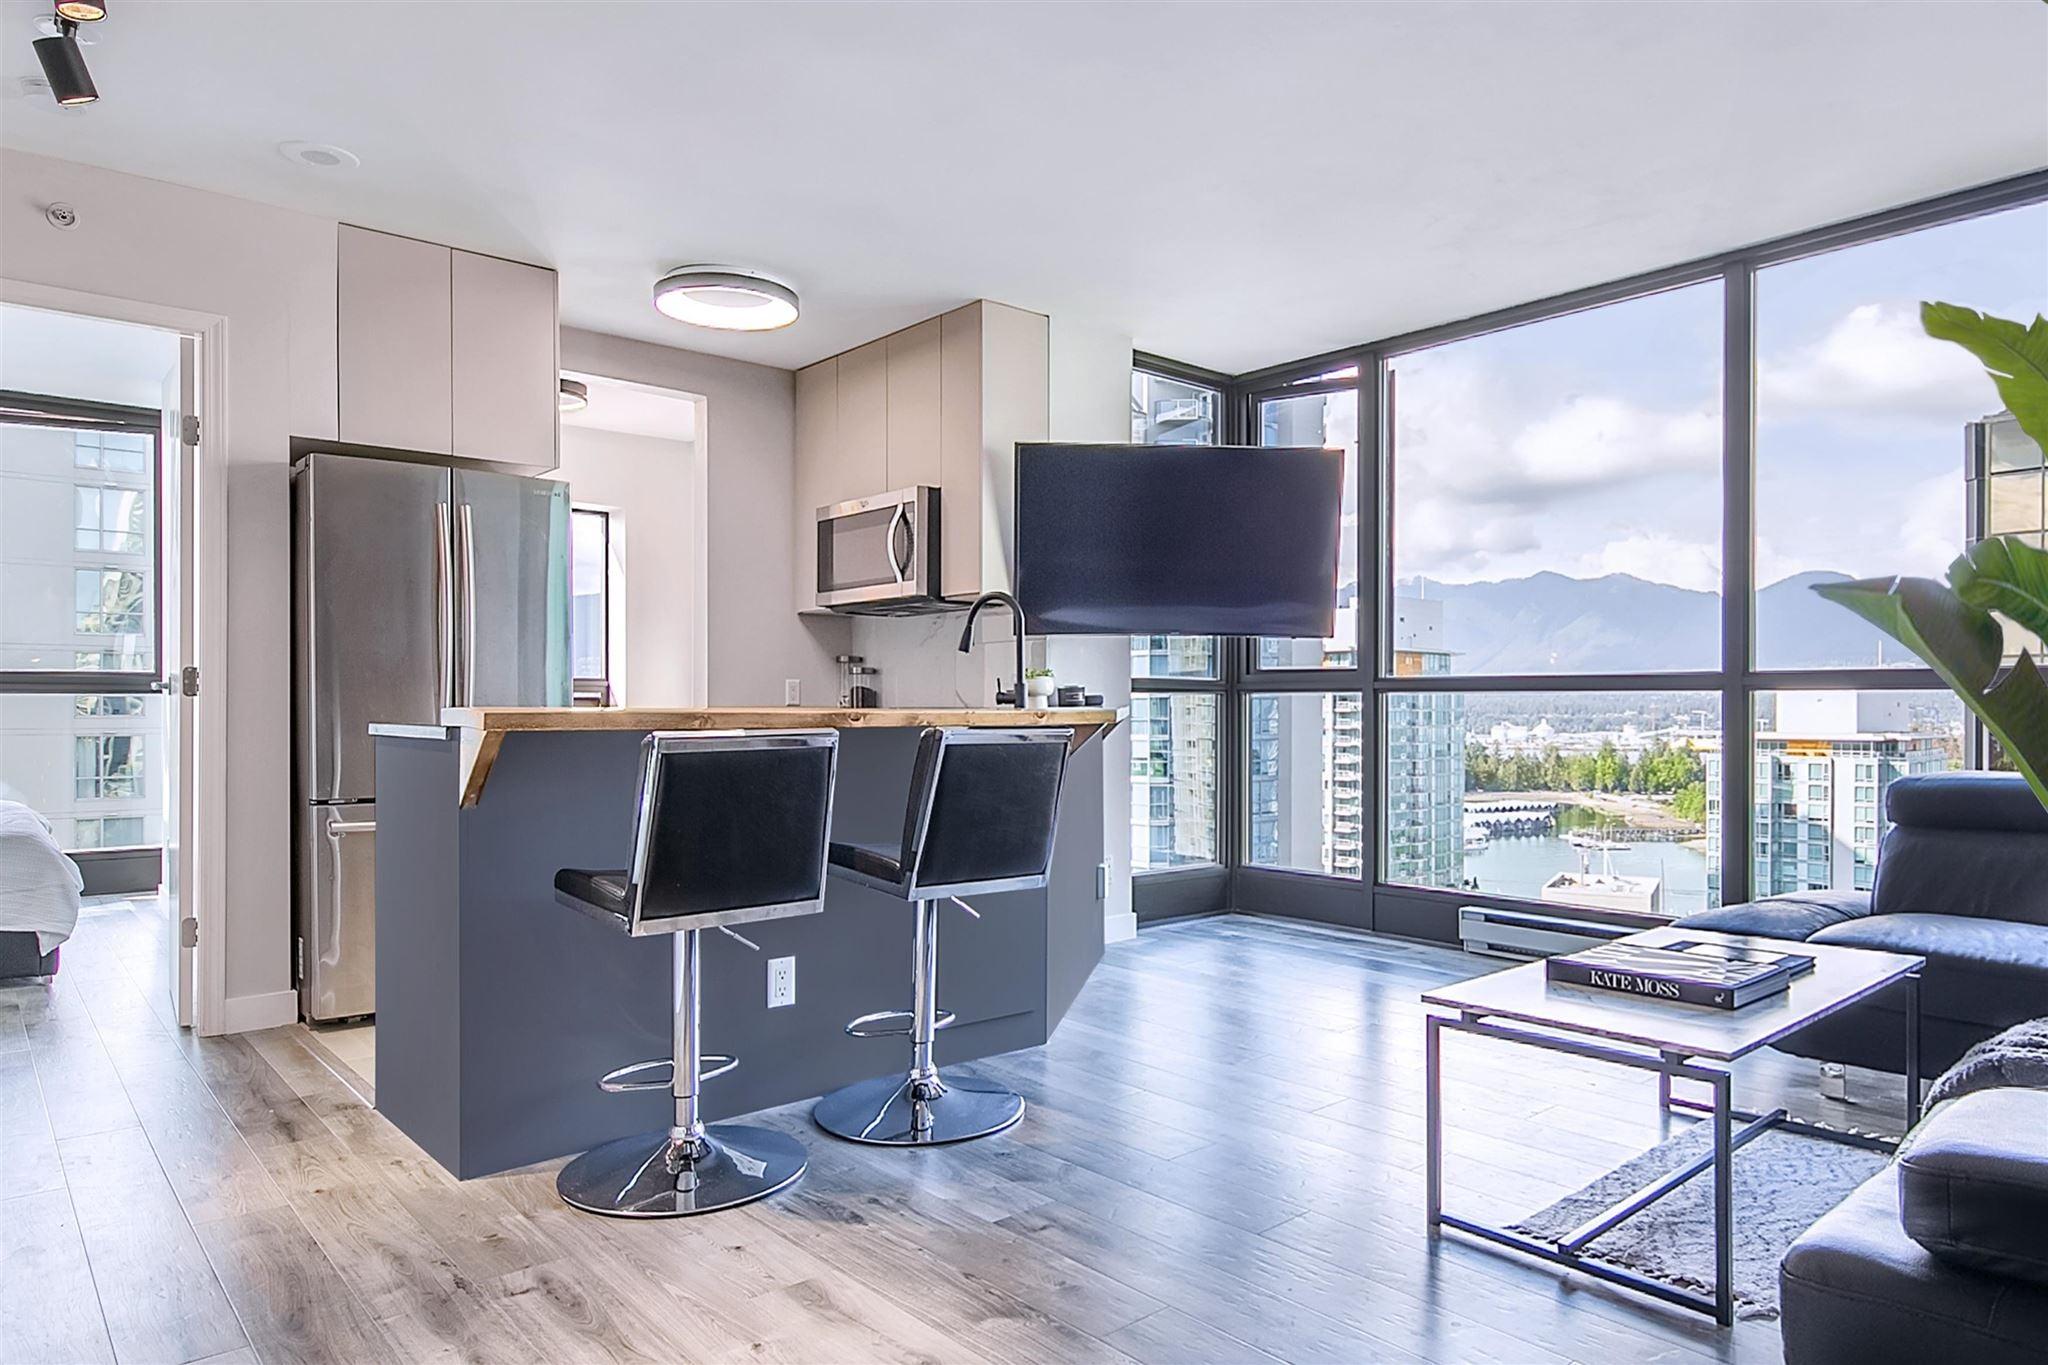 1710 1367 ALBERNI STREET - West End VW Apartment/Condo for sale, 1 Bedroom (R2615507) - #1